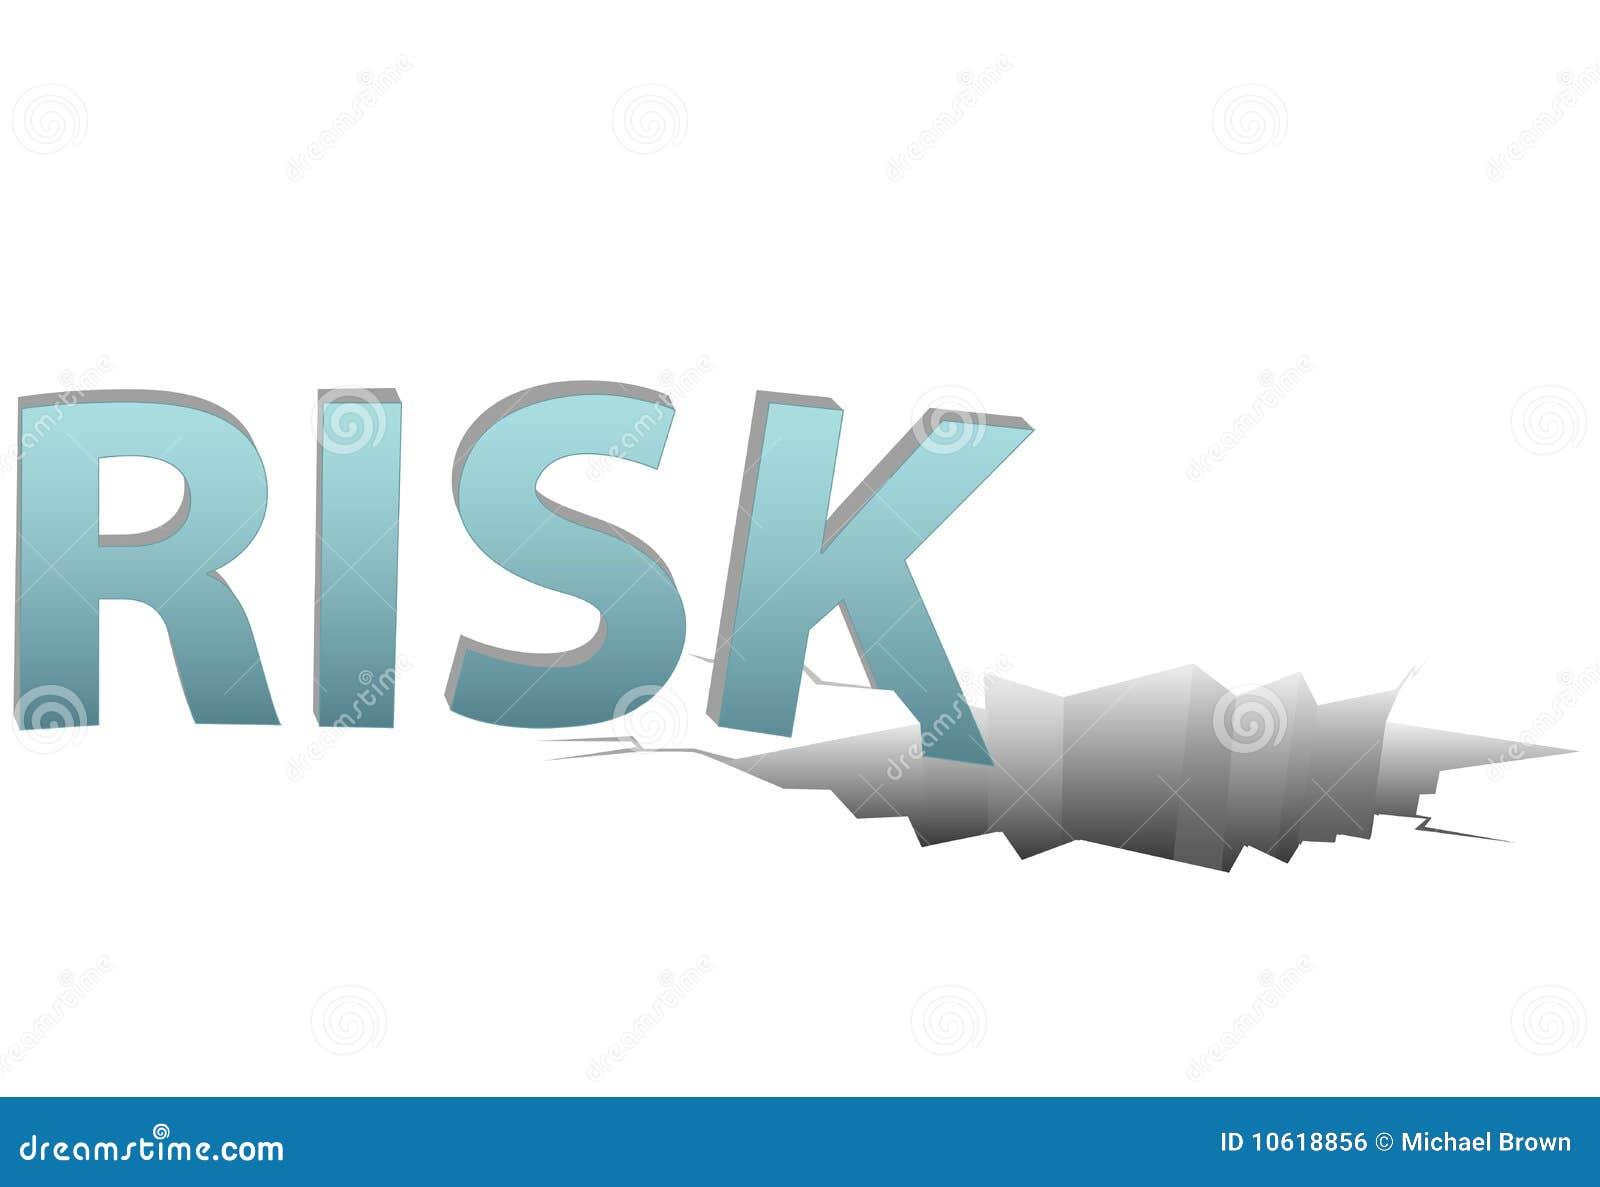 El RIESGO sin seguro baja en agujero financiero peligroso